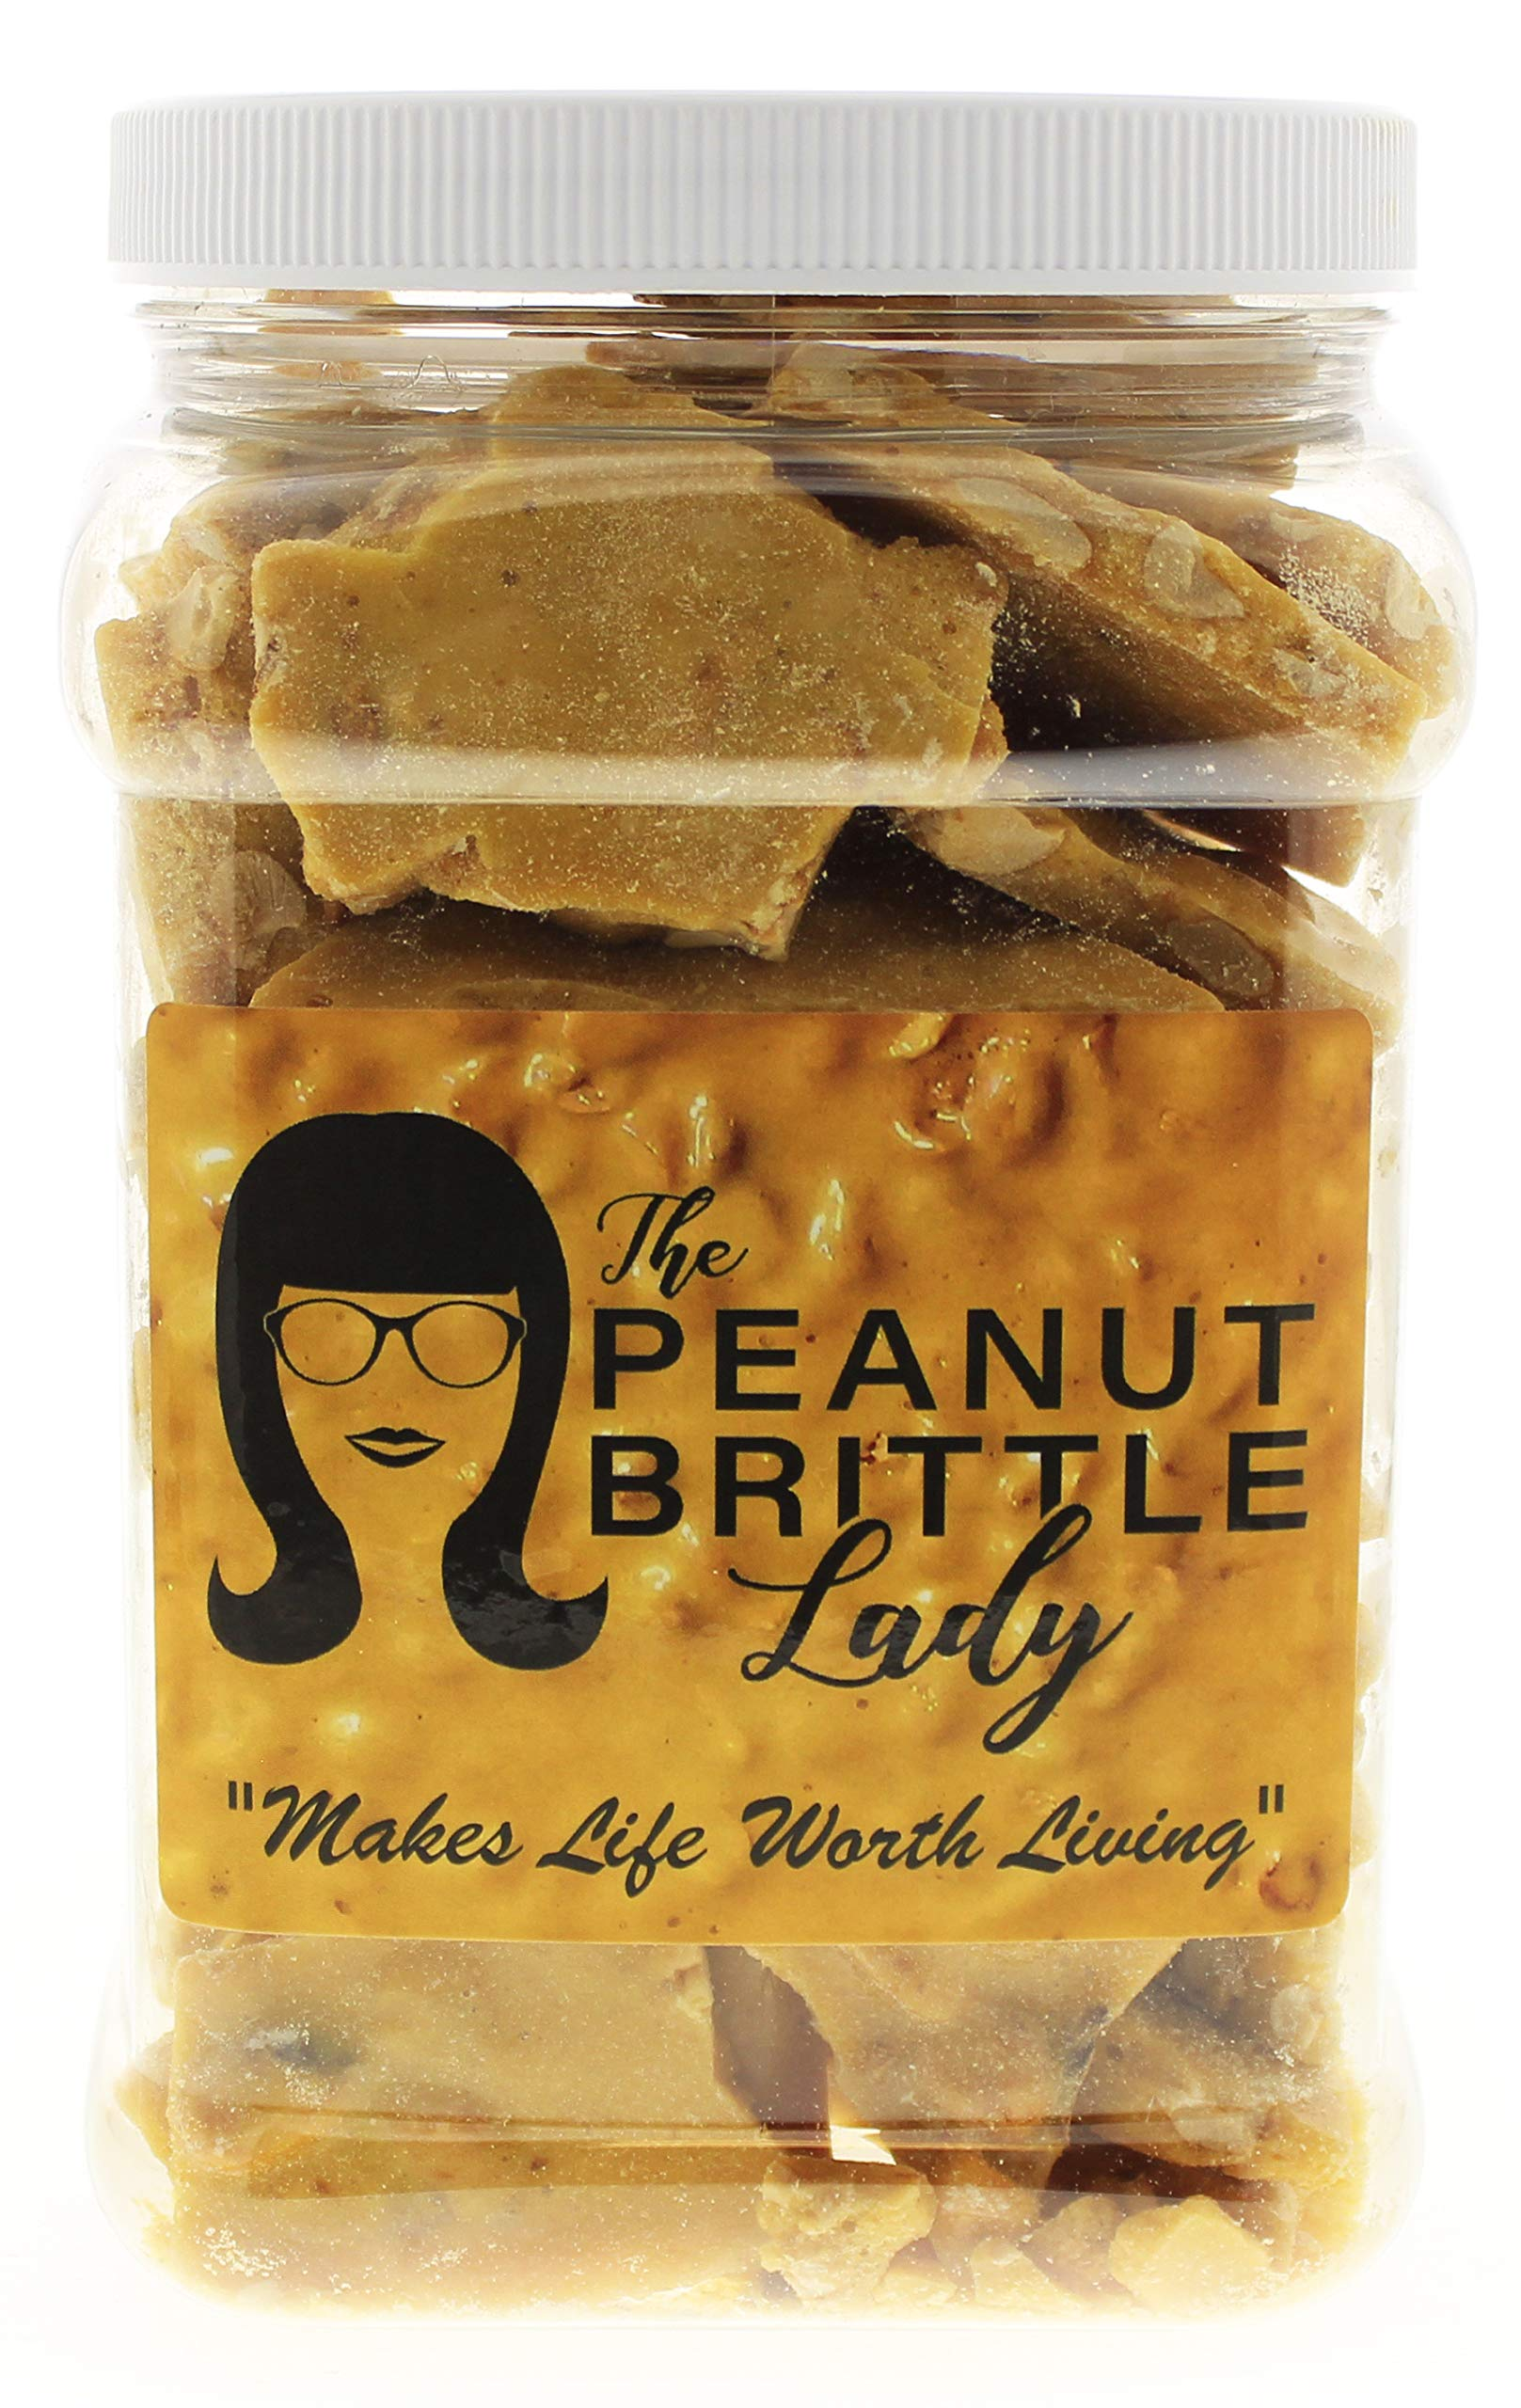 Top Shelf Handmade Gourmet Peanut Brittle Candy, Small Batch, Homemade; Size: Happy Gal (1/2 Gallon) by Peanut Brittle Lady